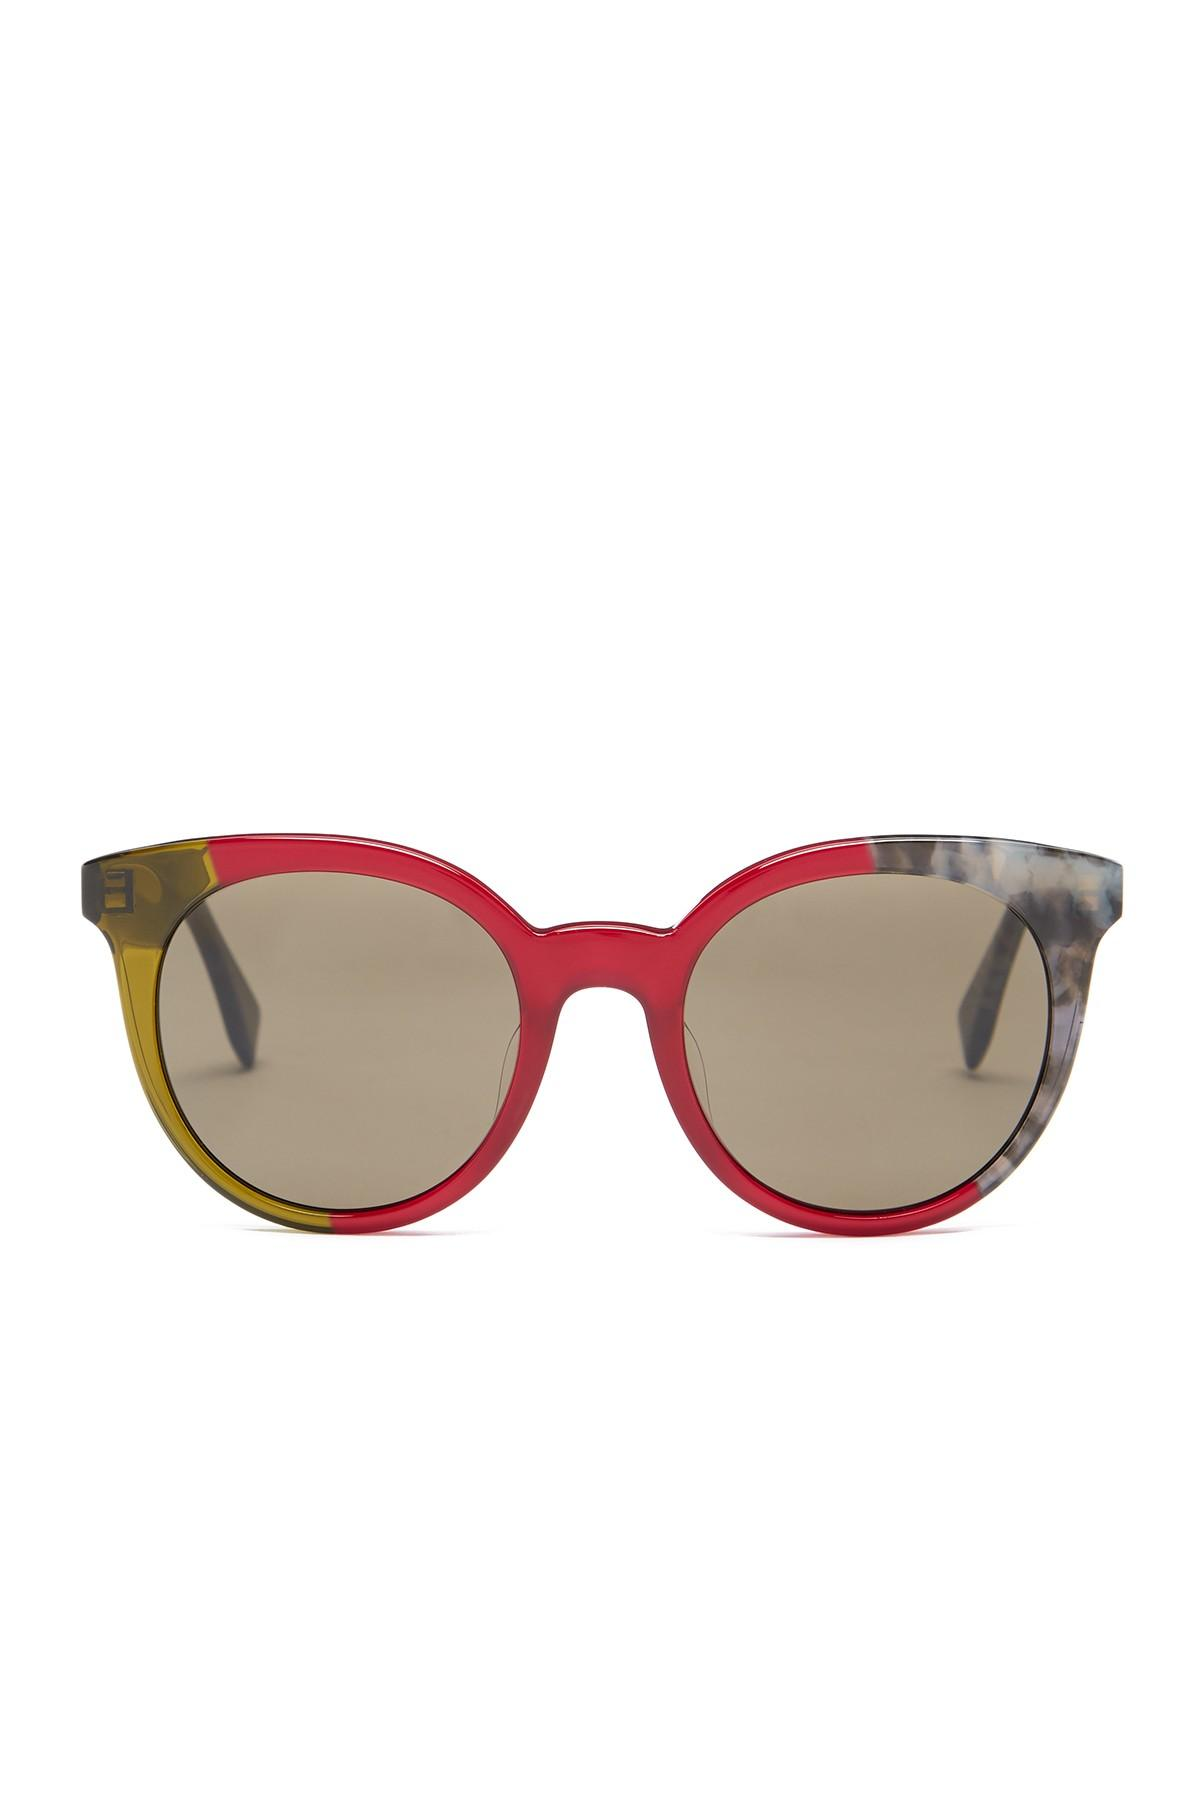 d4ec9bdc70d0 Fendi Round Aviator Sunglasses